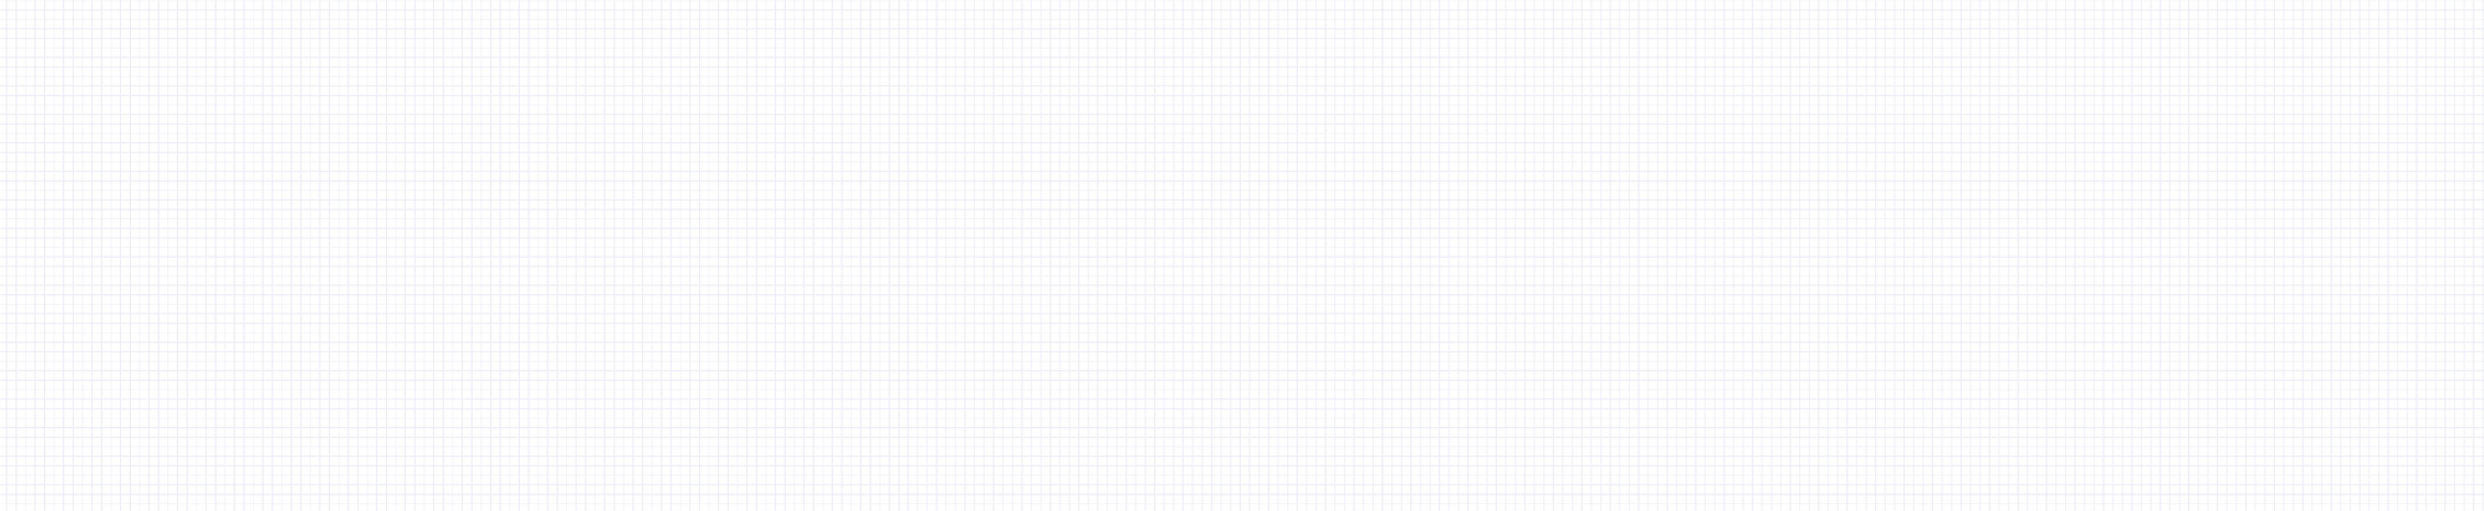 Graph Grid Rectangle_Background.jpg